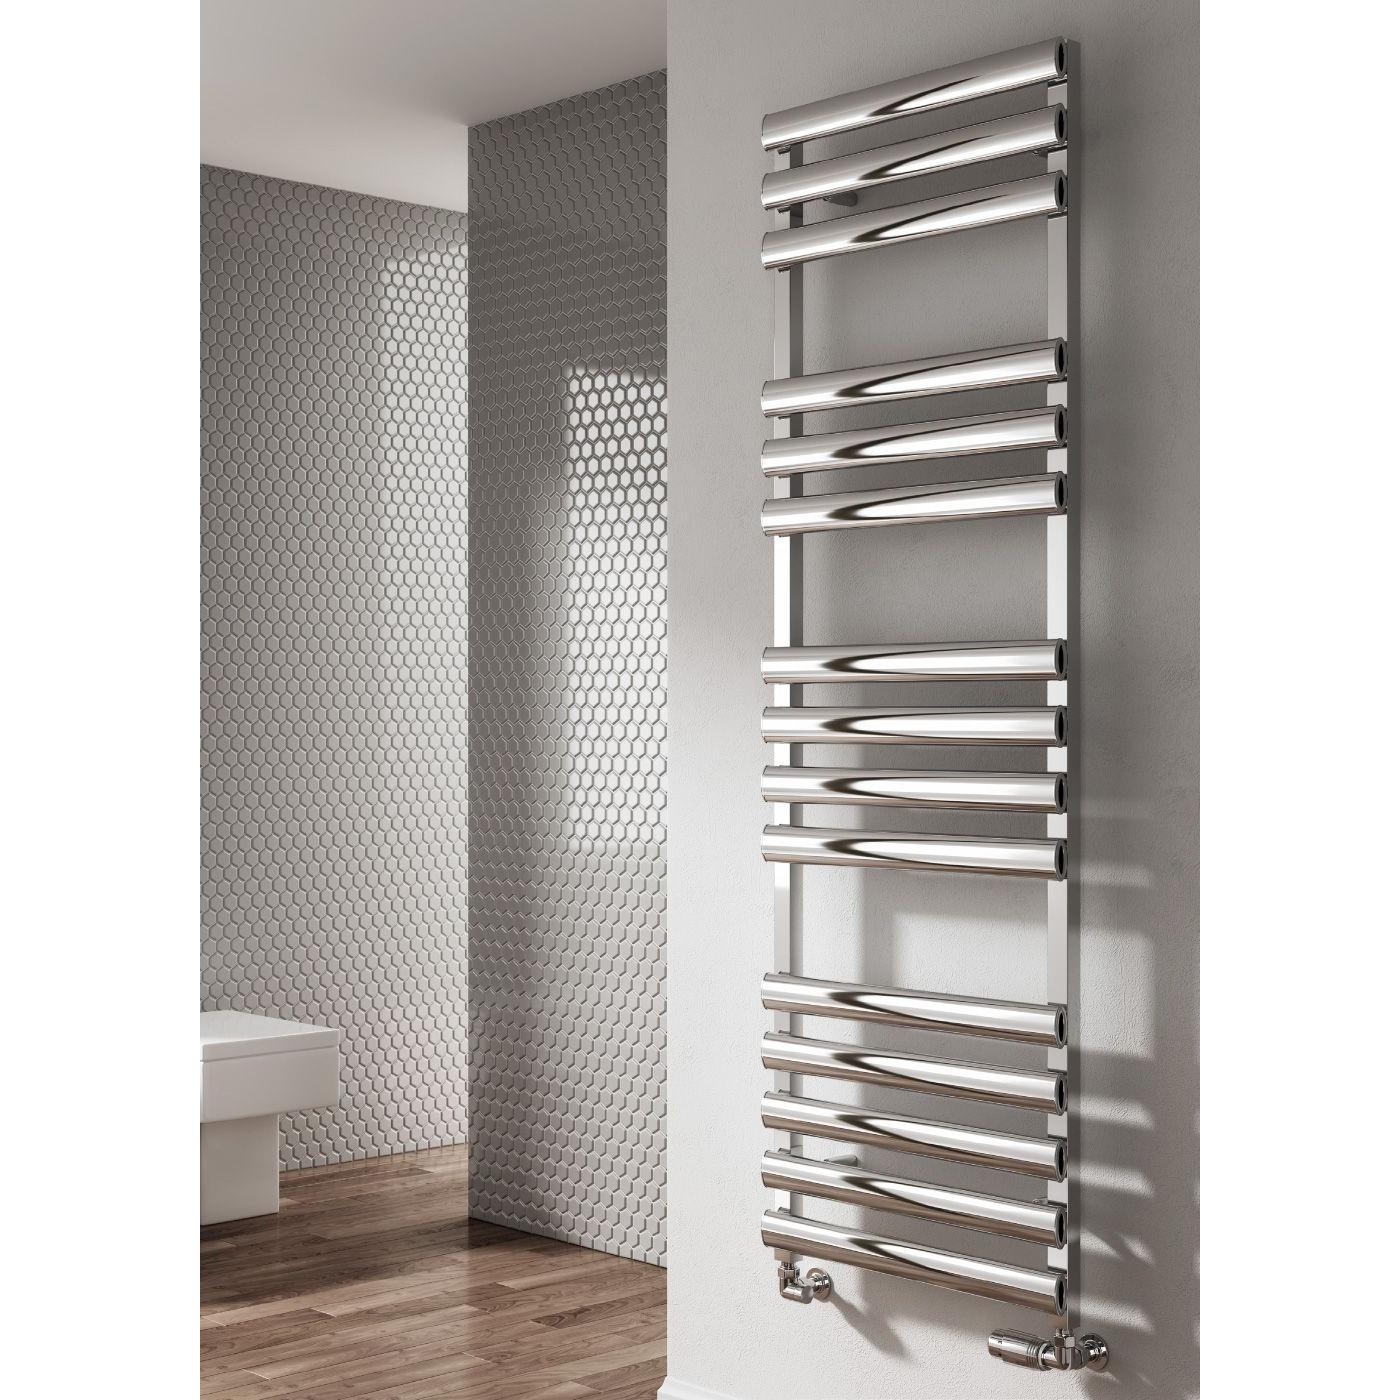 Reina Veroli Designer Heated Towel Rail 750mm H x 480mm W Polished